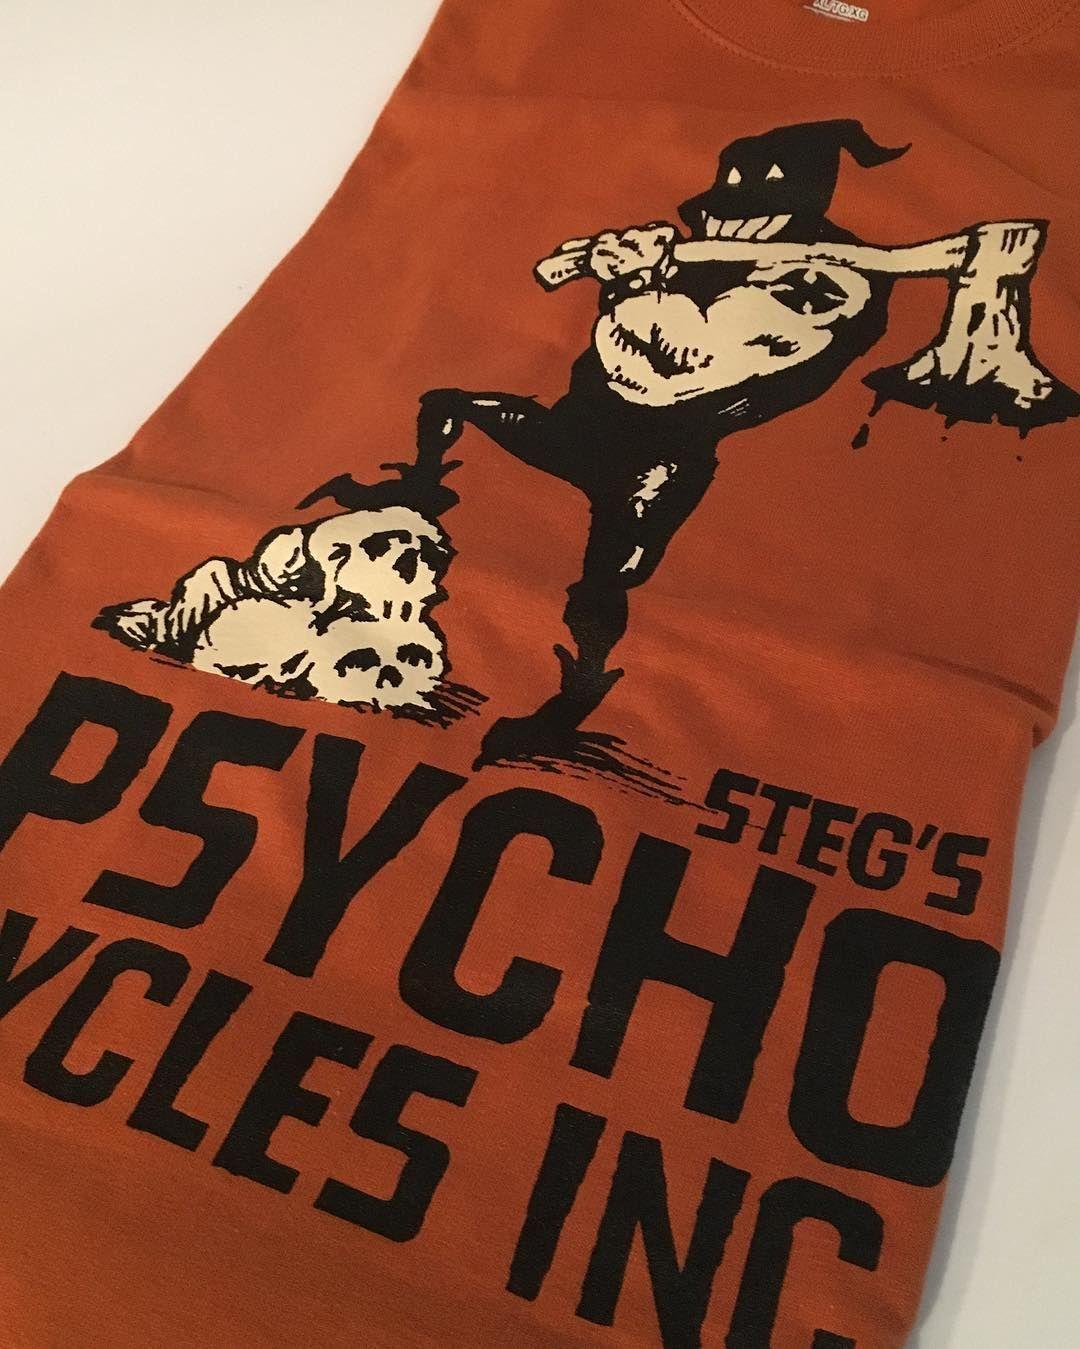 PSYCHO CYCLES INC. Axeman Tee on Burnt Orange Heavy Weight Cotton #psychocycles #nyc #sevensinschoppers #stegvonheintz #chopper #harley #shovelhead #skulls #axeman #axe #executioner